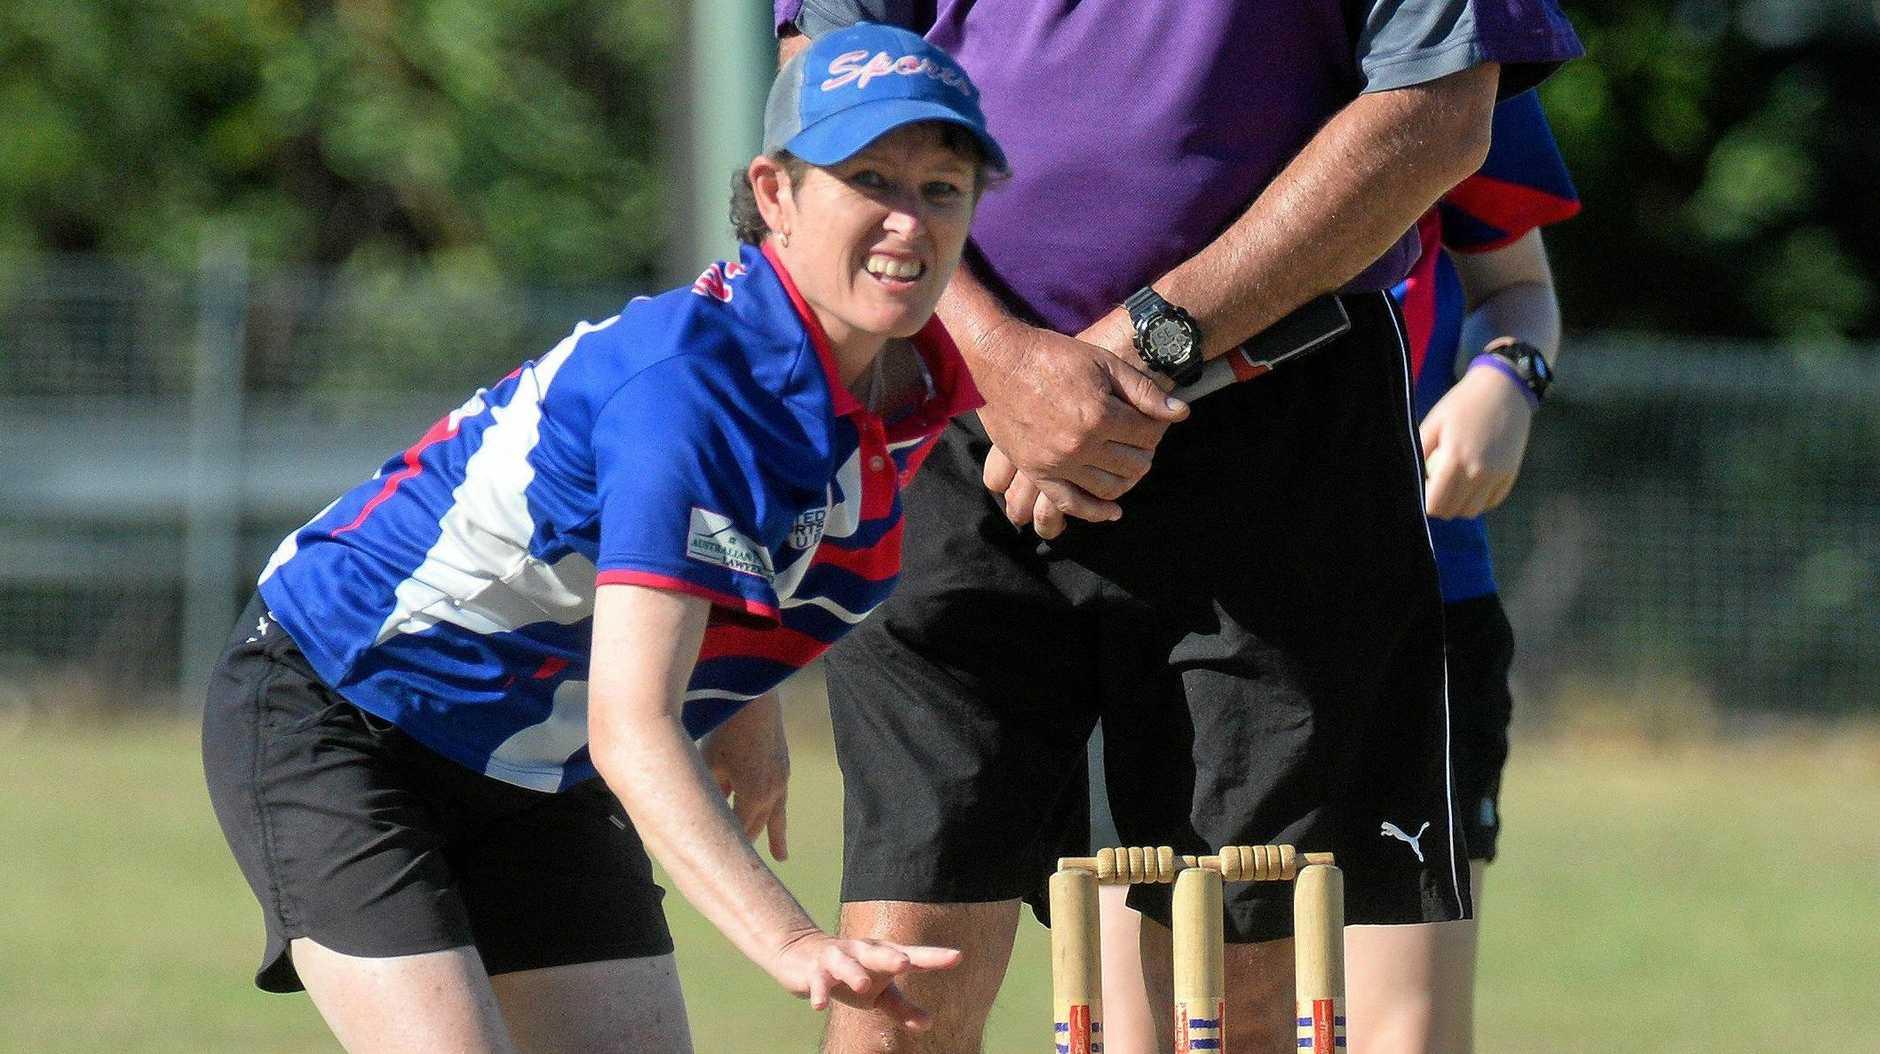 Sports bowler Lee Scudds.